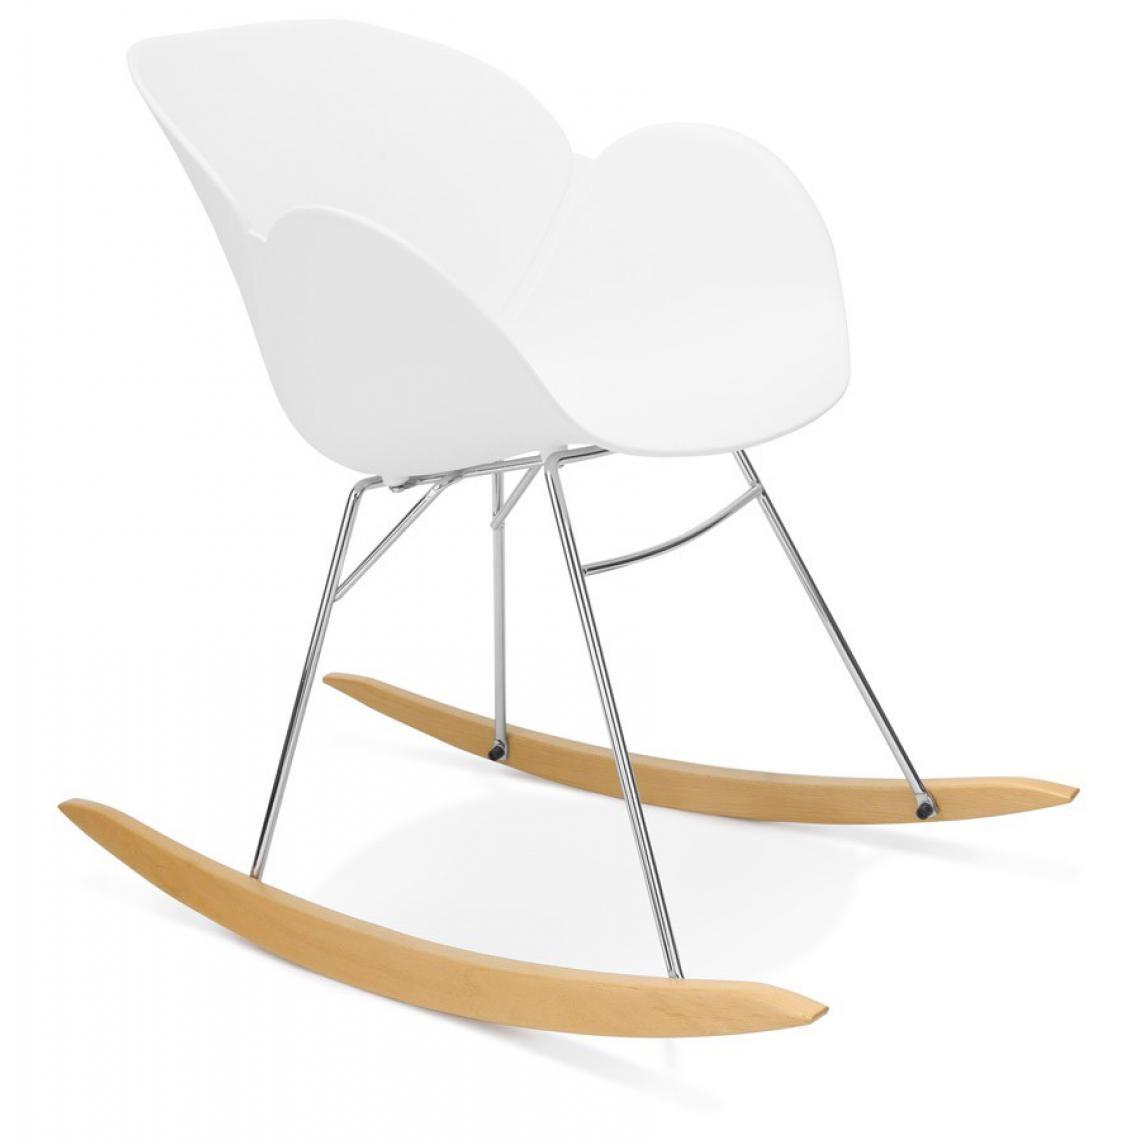 fauteuil a bascule en plastique blanc cherokee